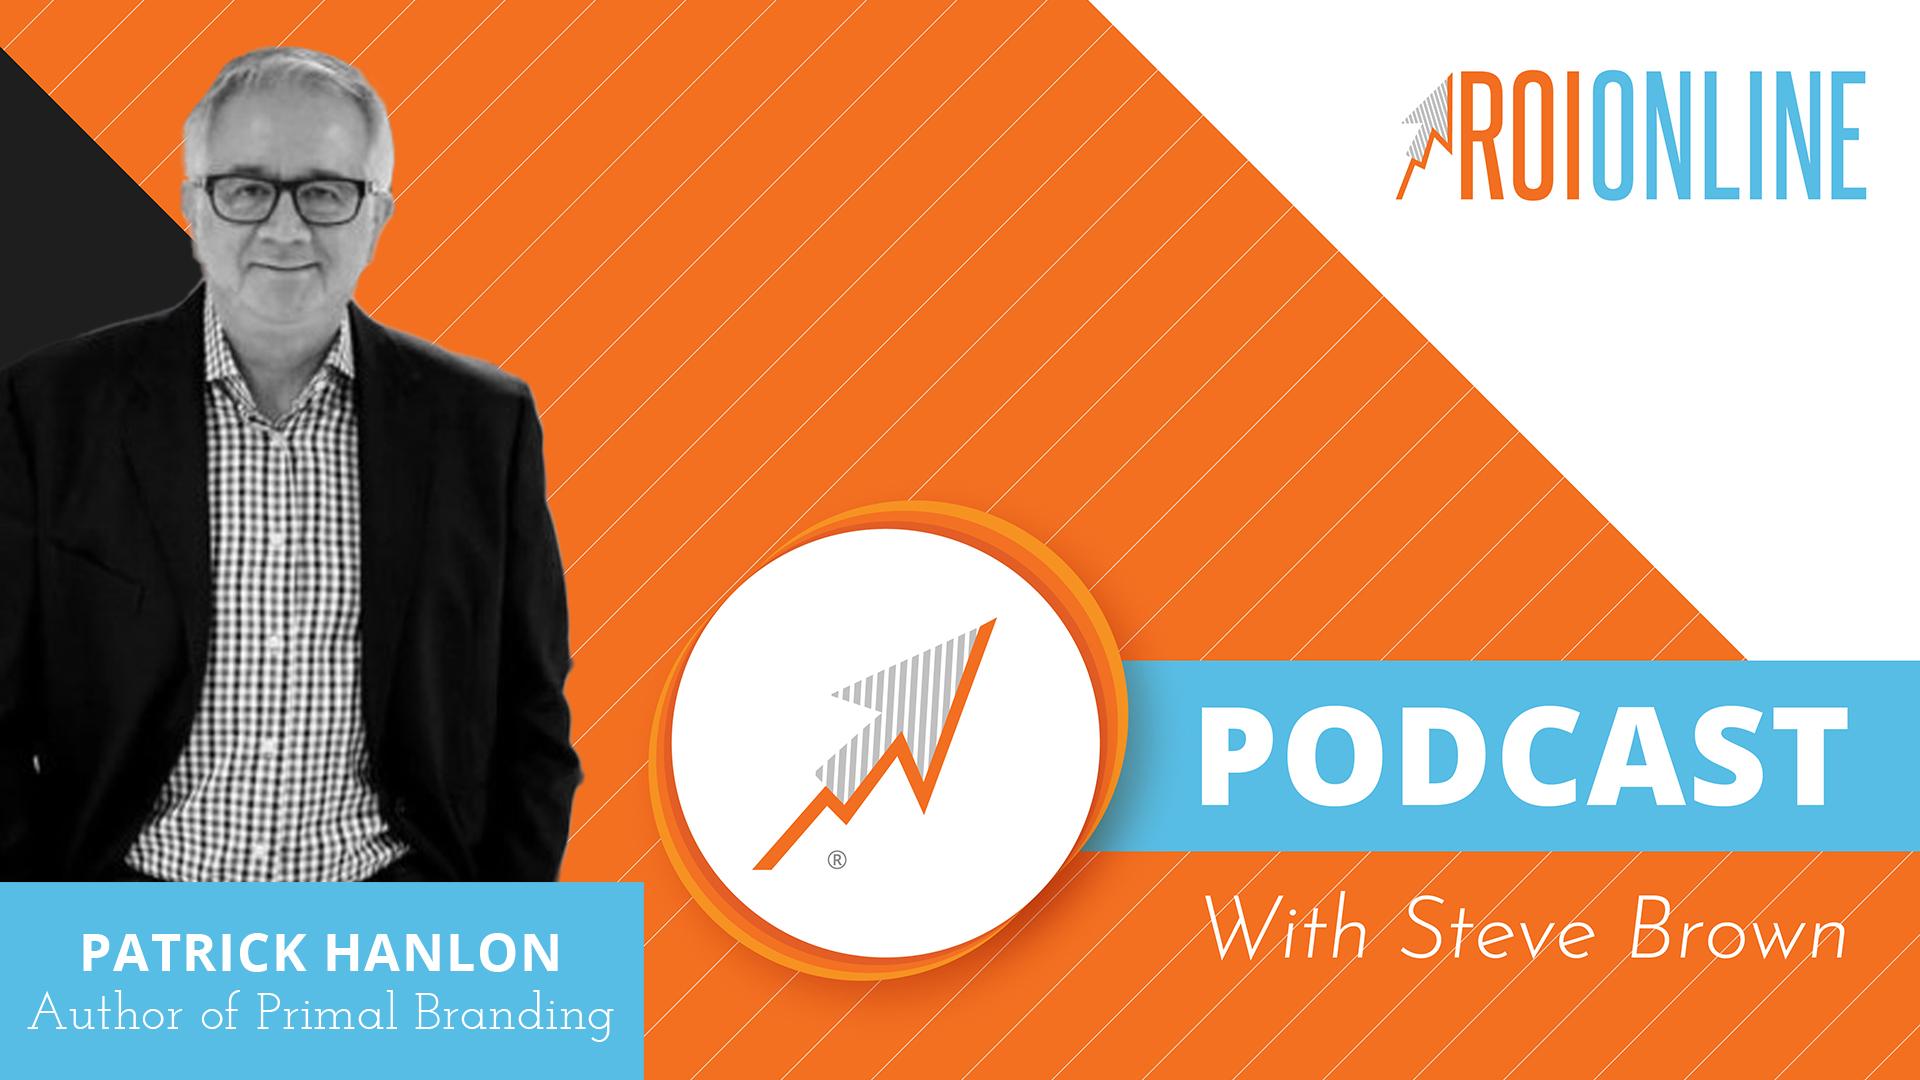 ROI Online podcast with Patrick Hanlon